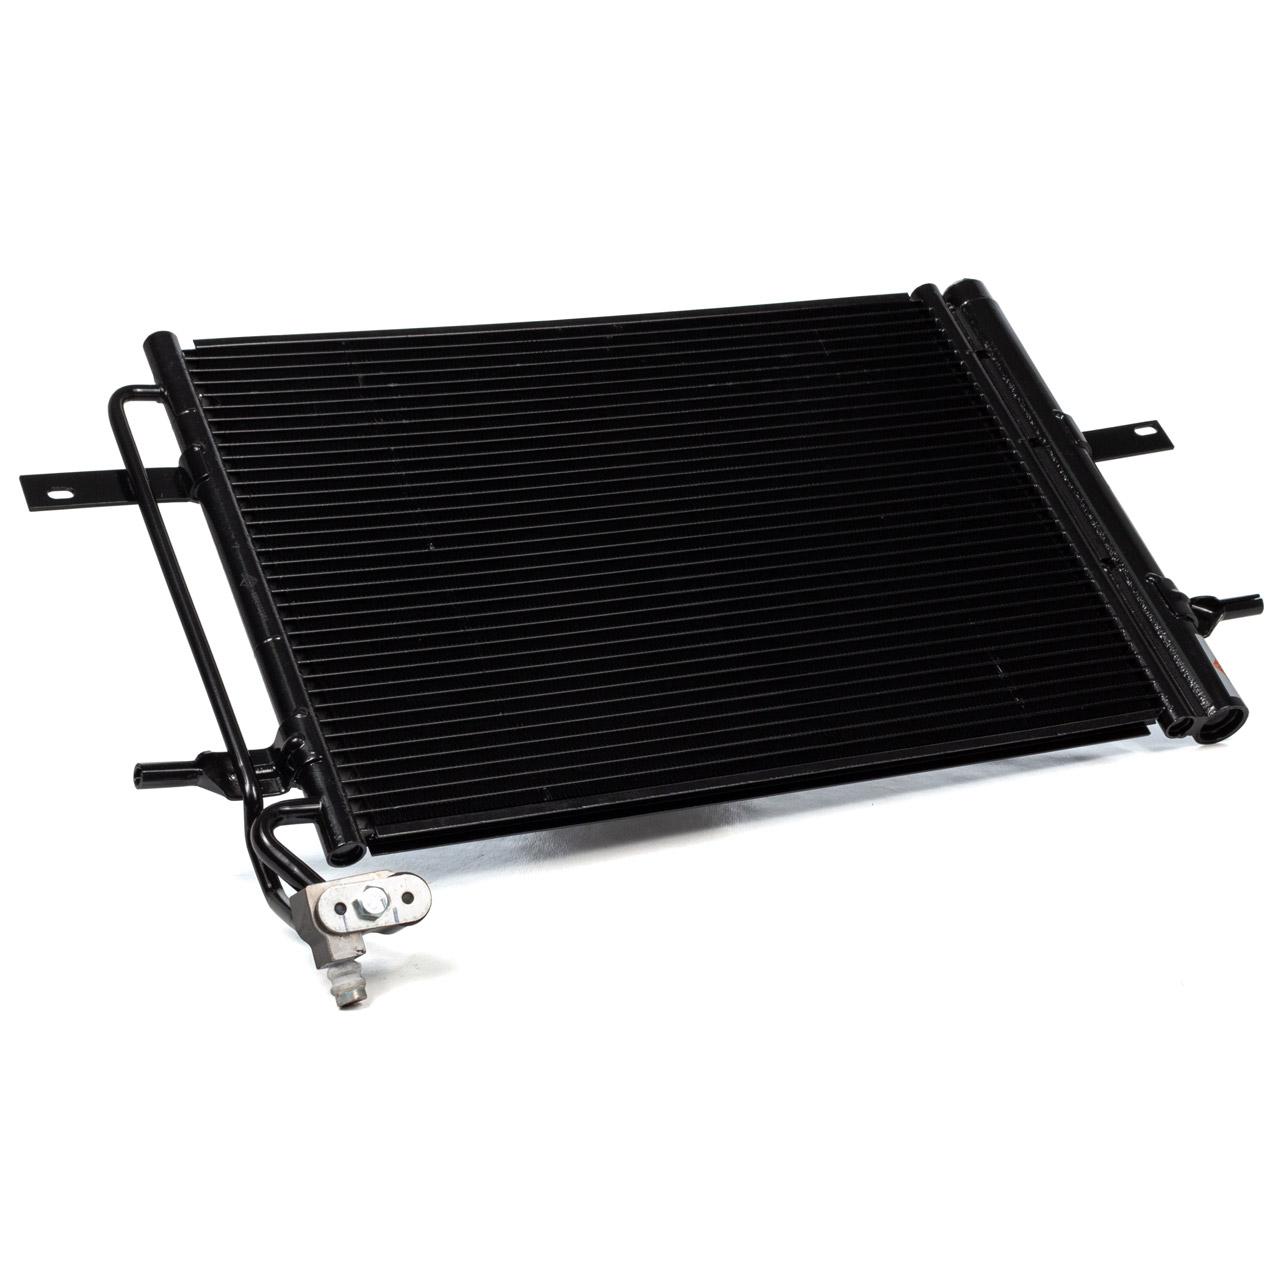 NRF 350034 EASY FIT Kondensator Klimaanlage OPEL Meriva A X03 1.4 16V 1.6 13303641